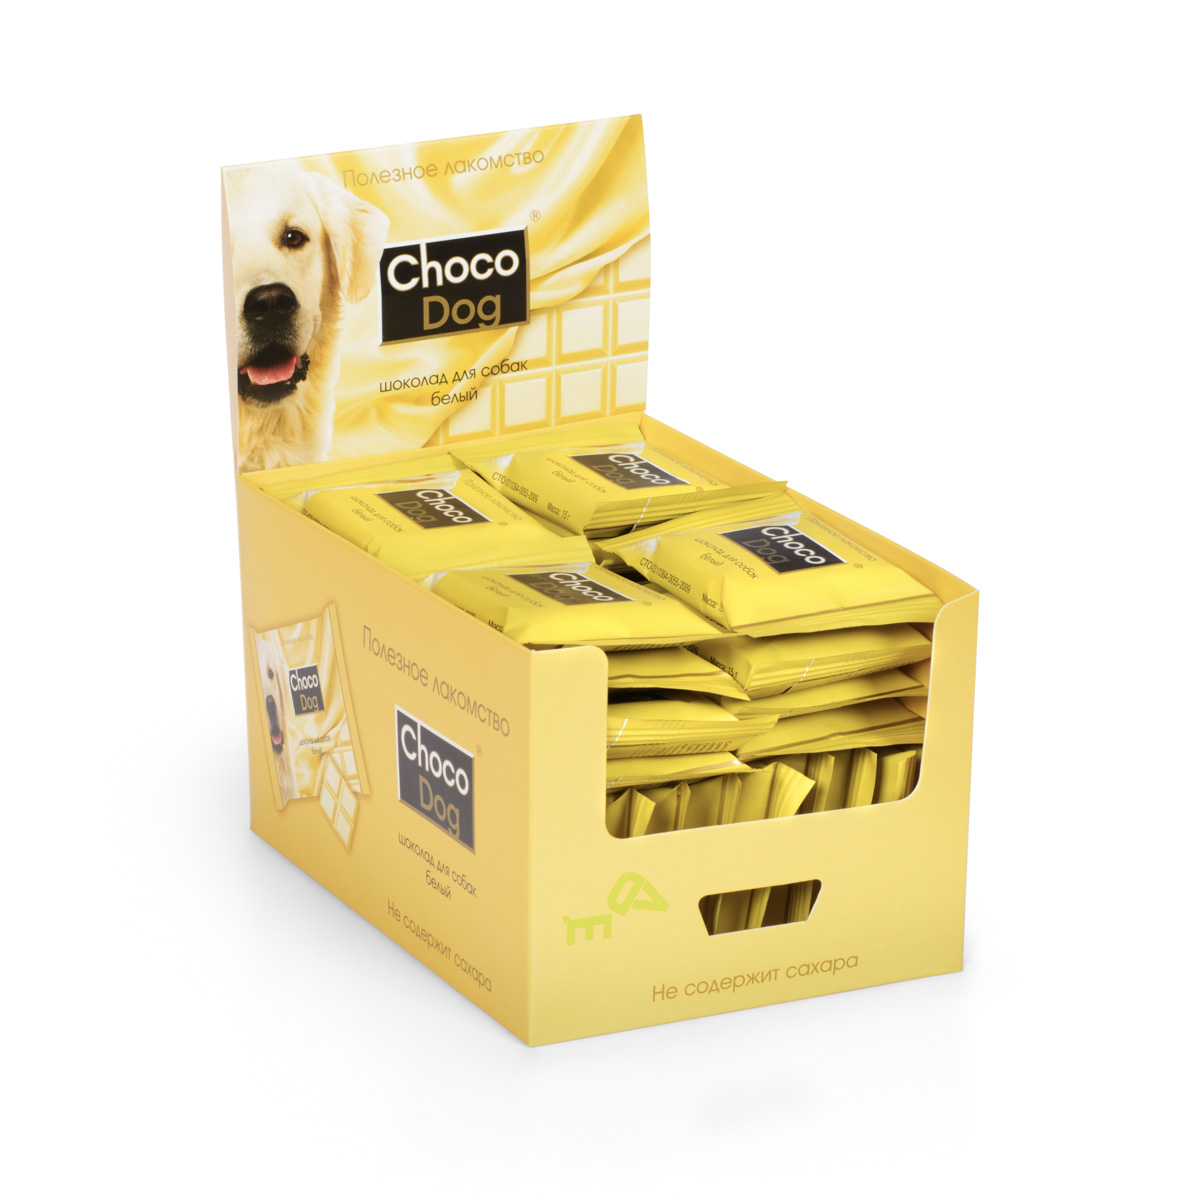 Лакомство для собак VEDA Choco Dog, белый шоколад, 40 х 15 г лакомство для кошек veda веселый мур р рмелад со вкусом курицы 7 г